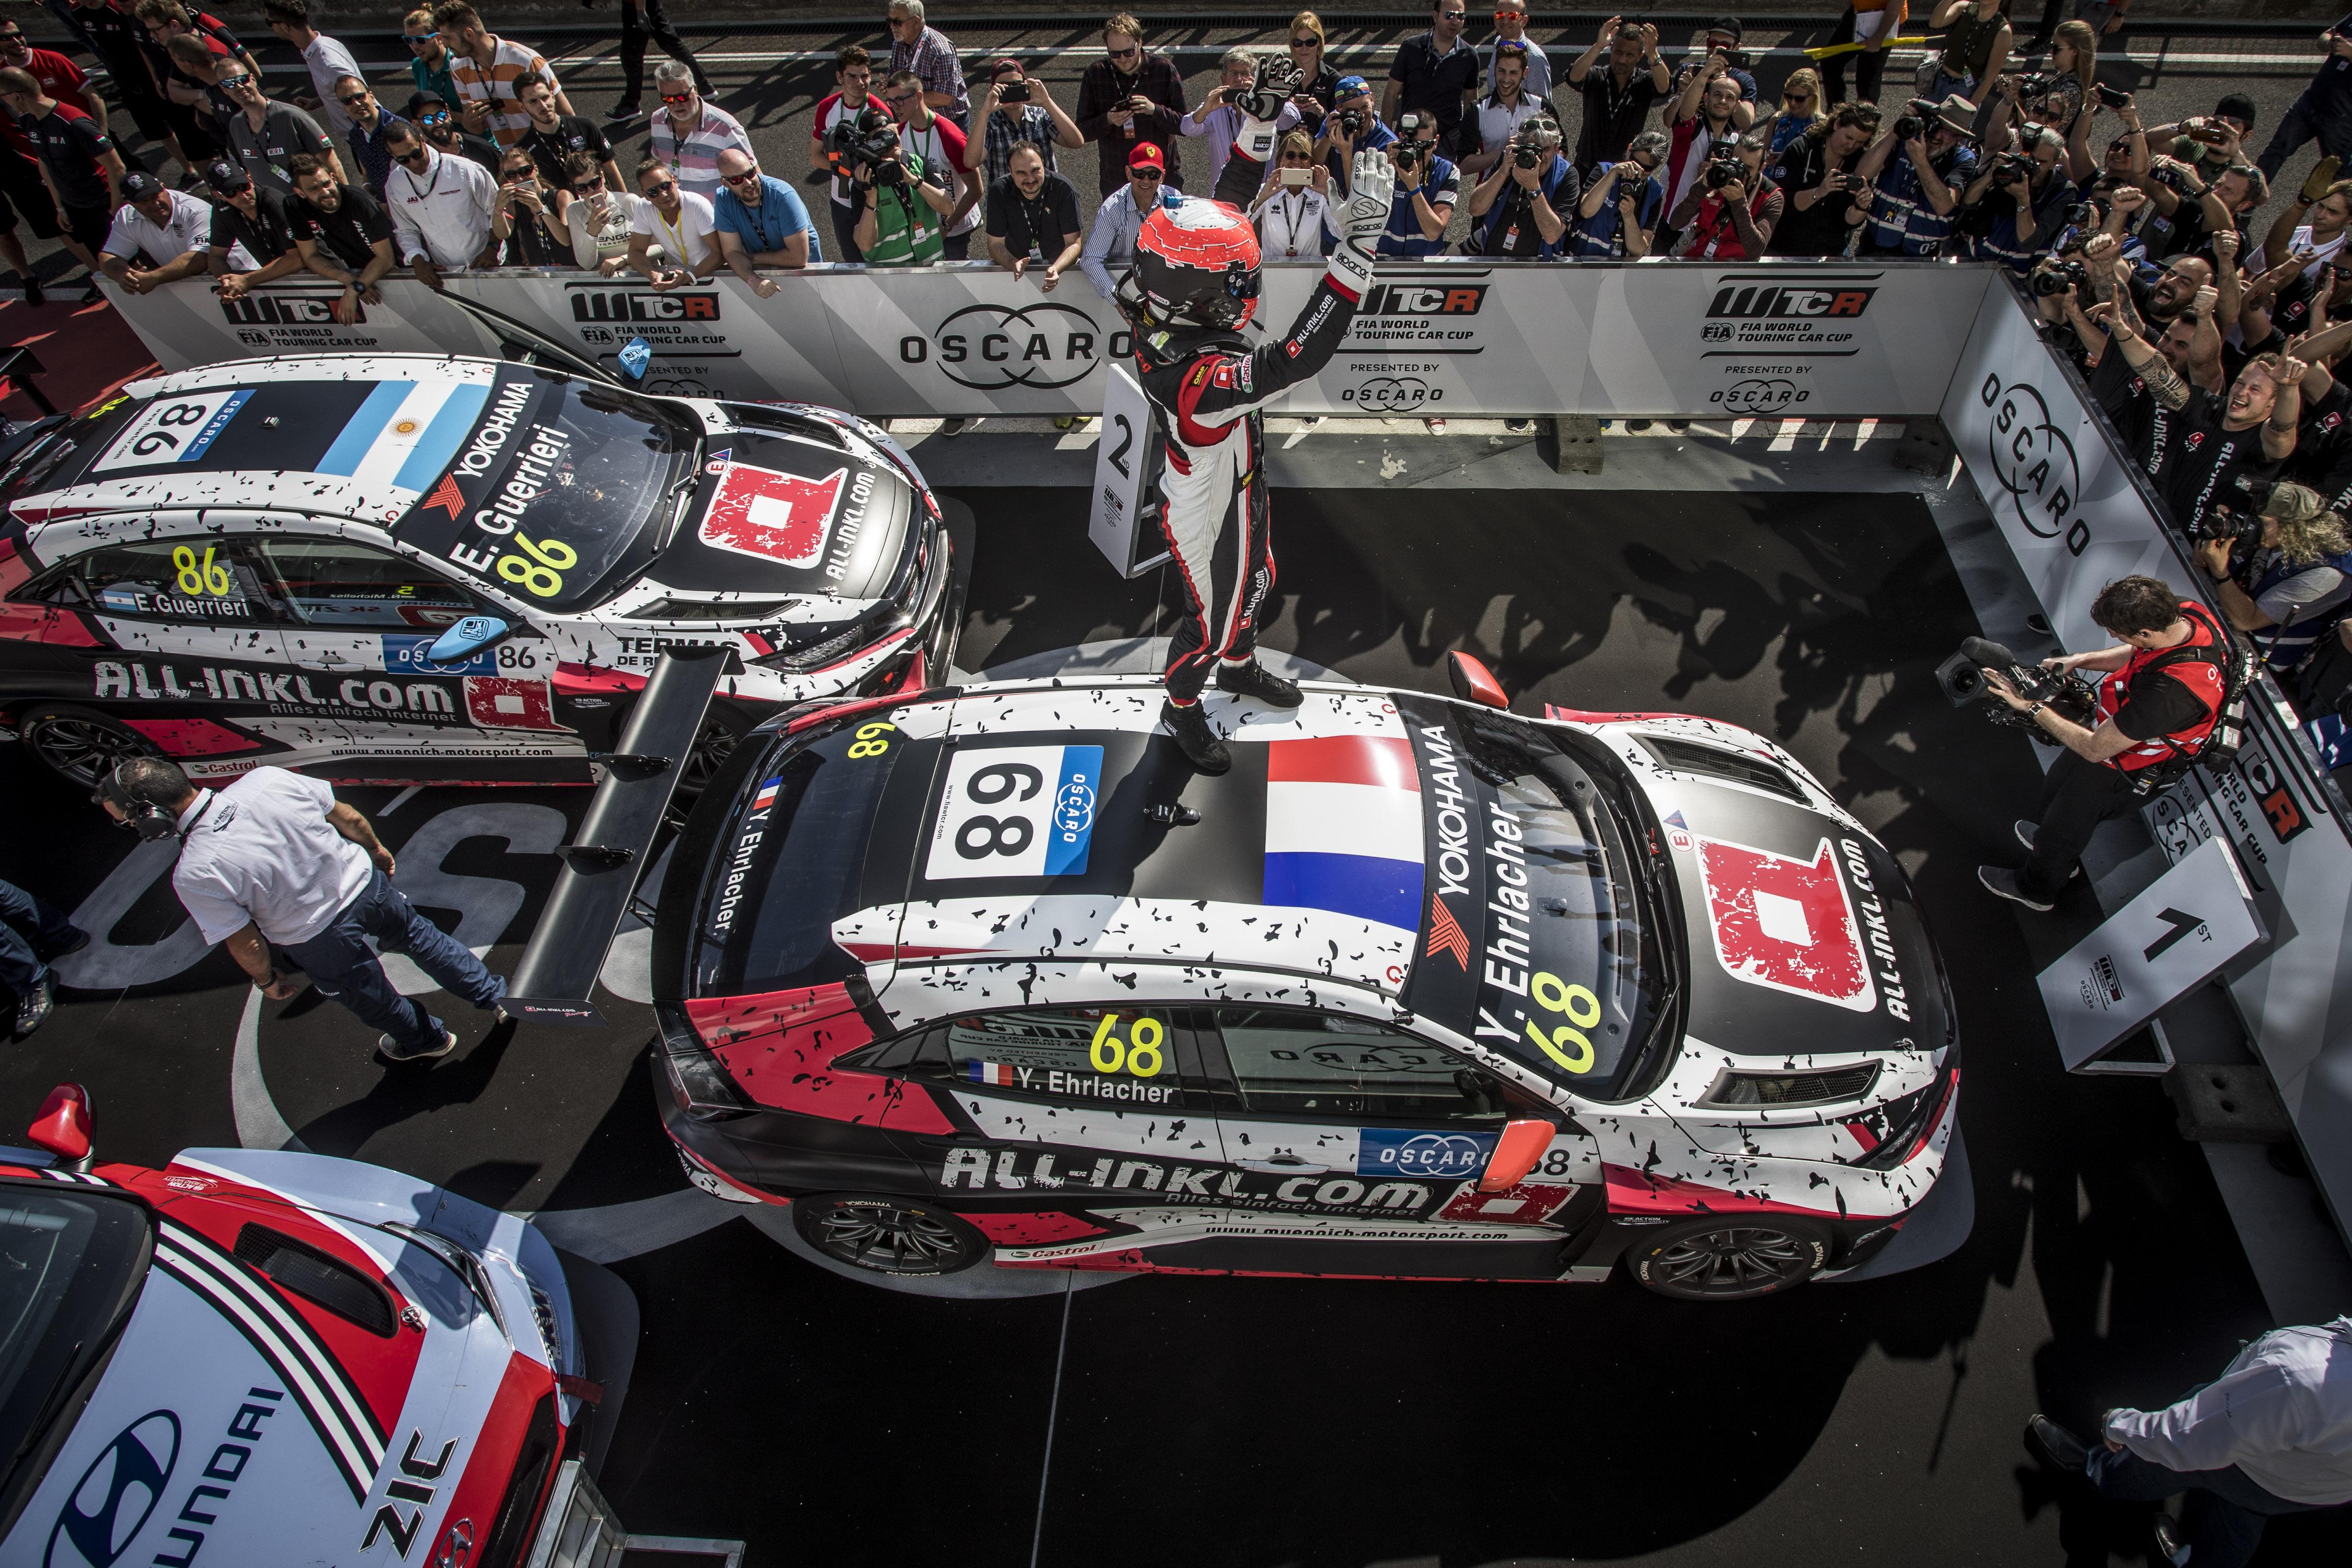 WTCR race recap: #2 Hungary